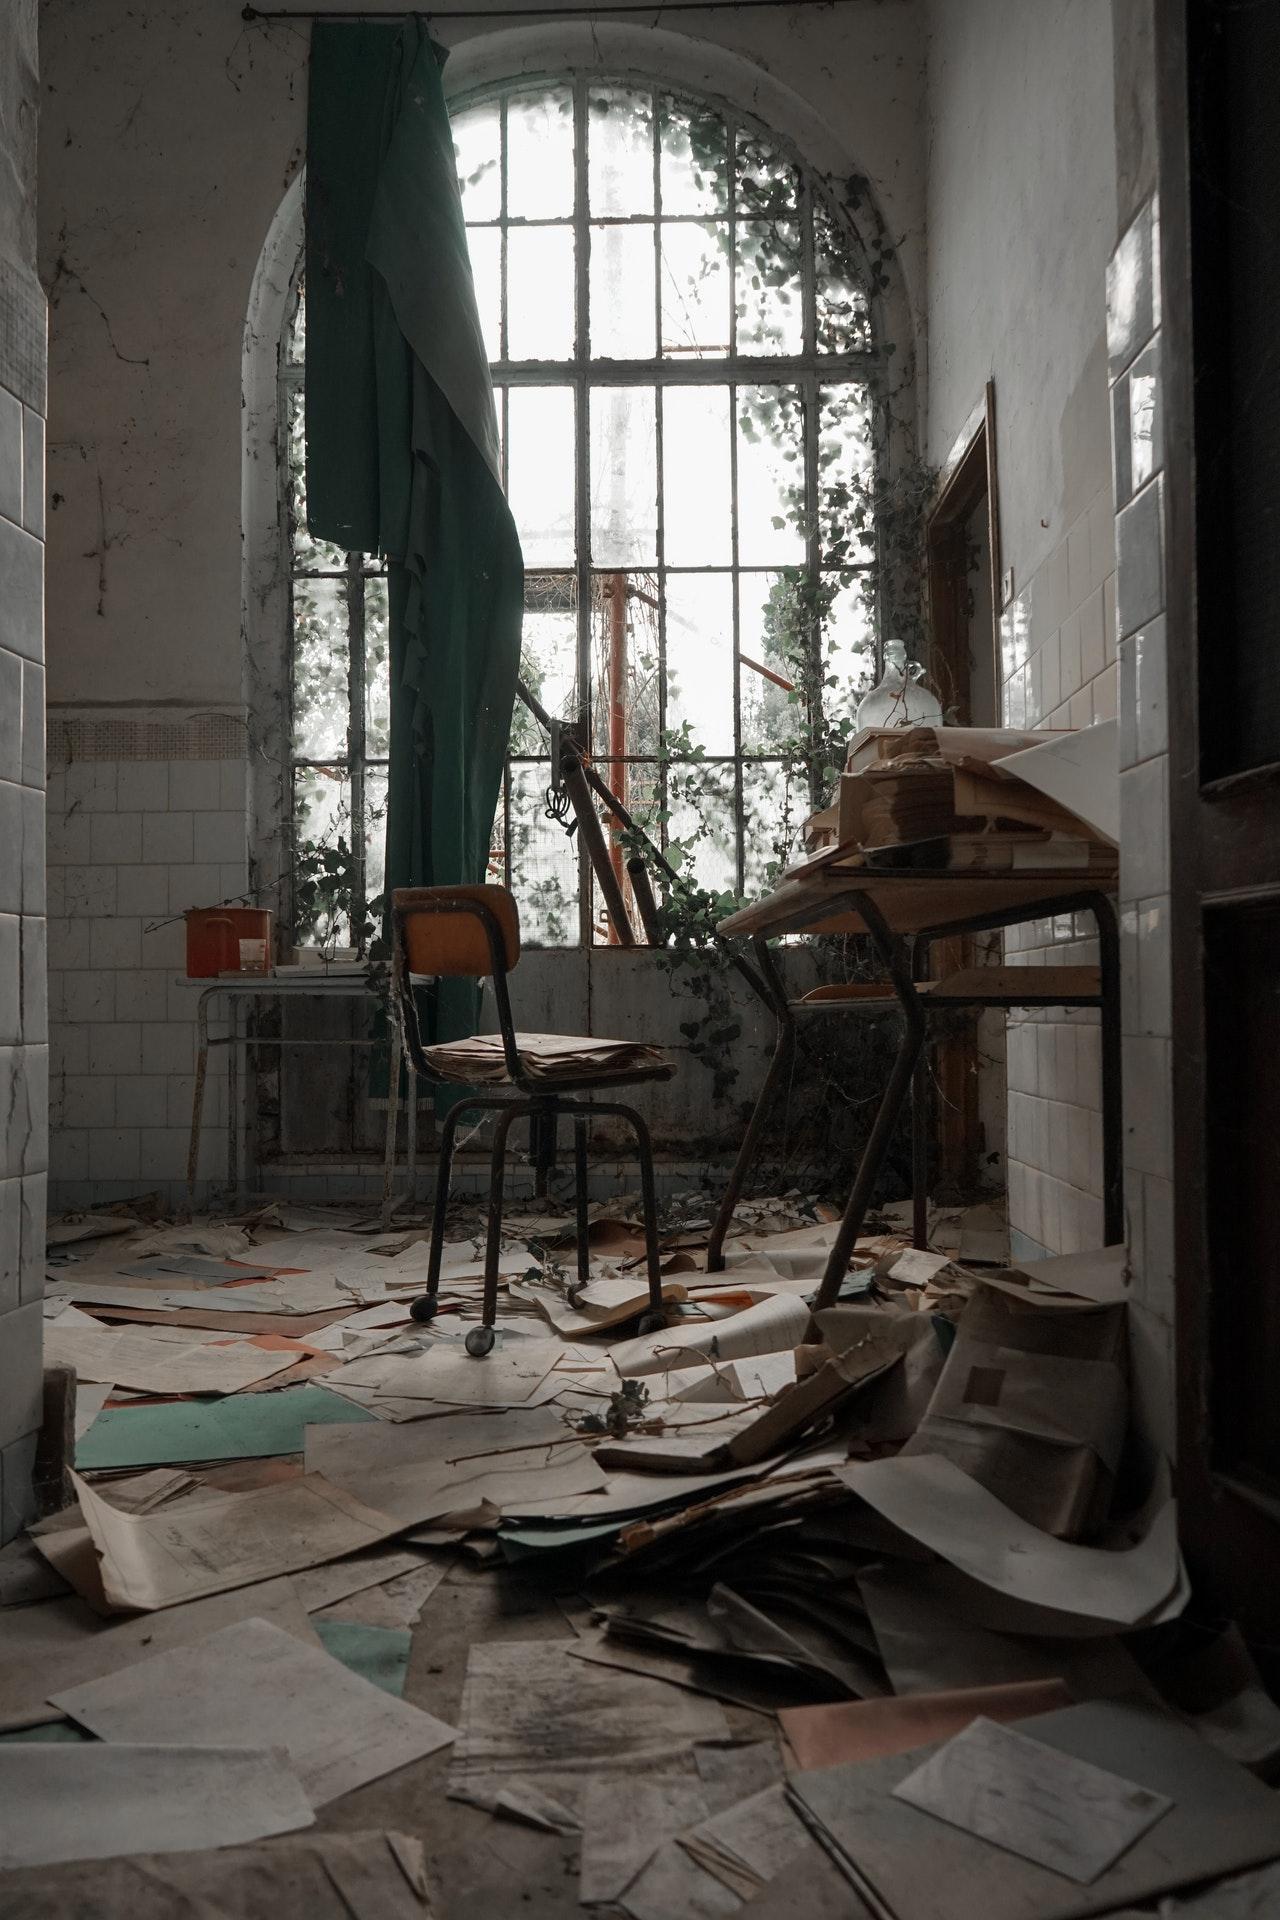 Abandoned office - Urbex Photo